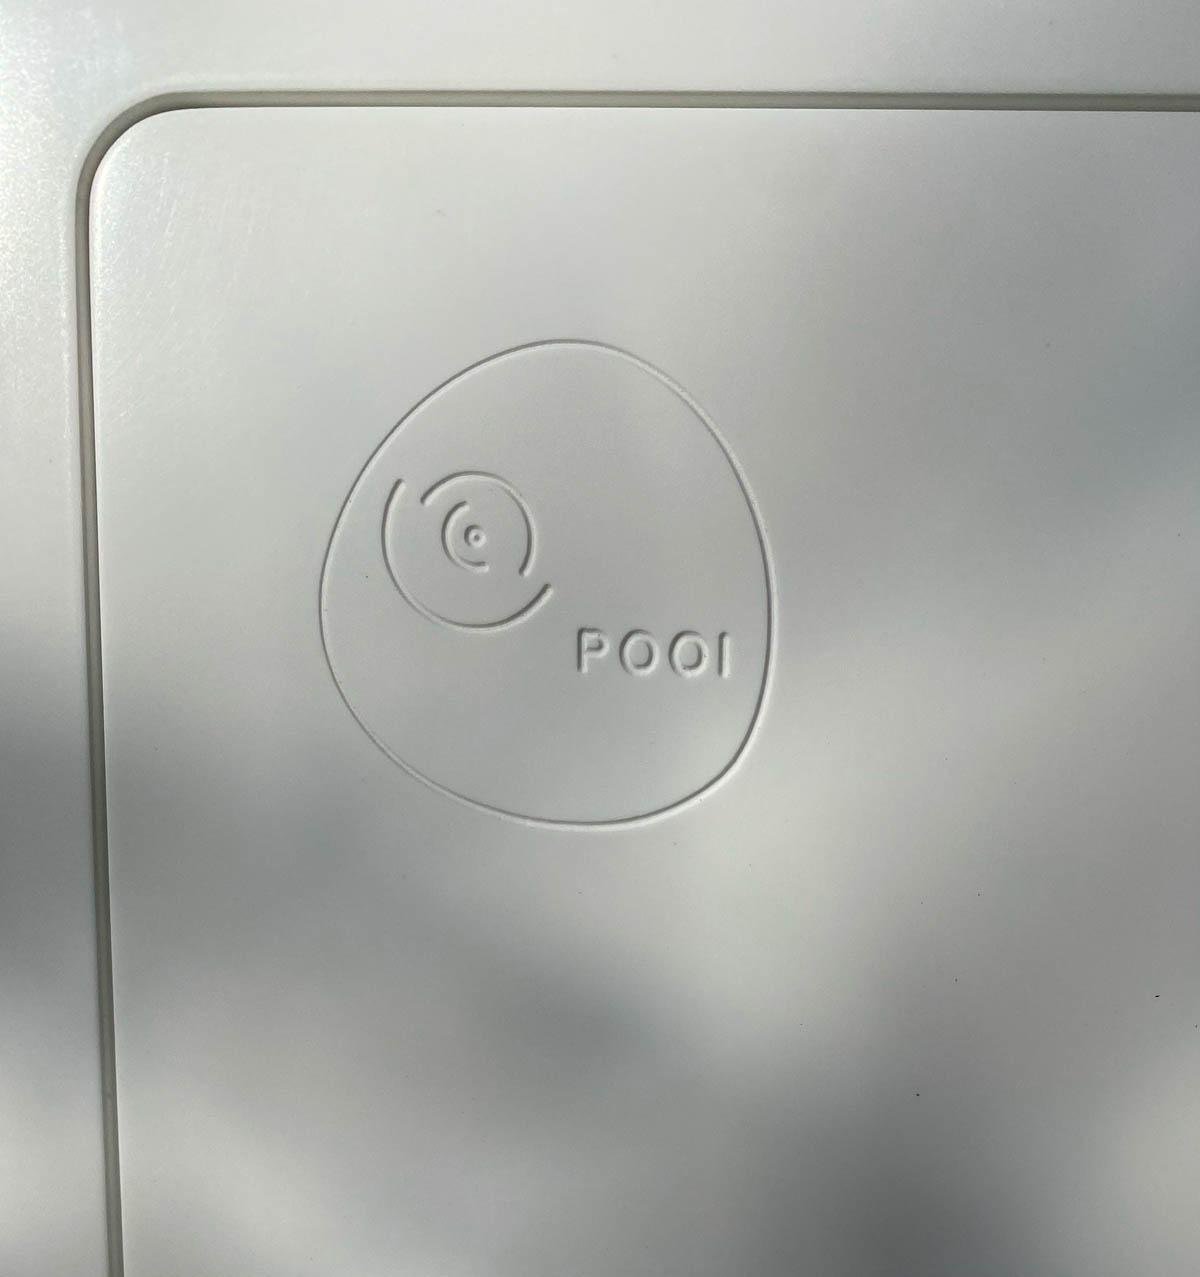 POOI - Dental suction system